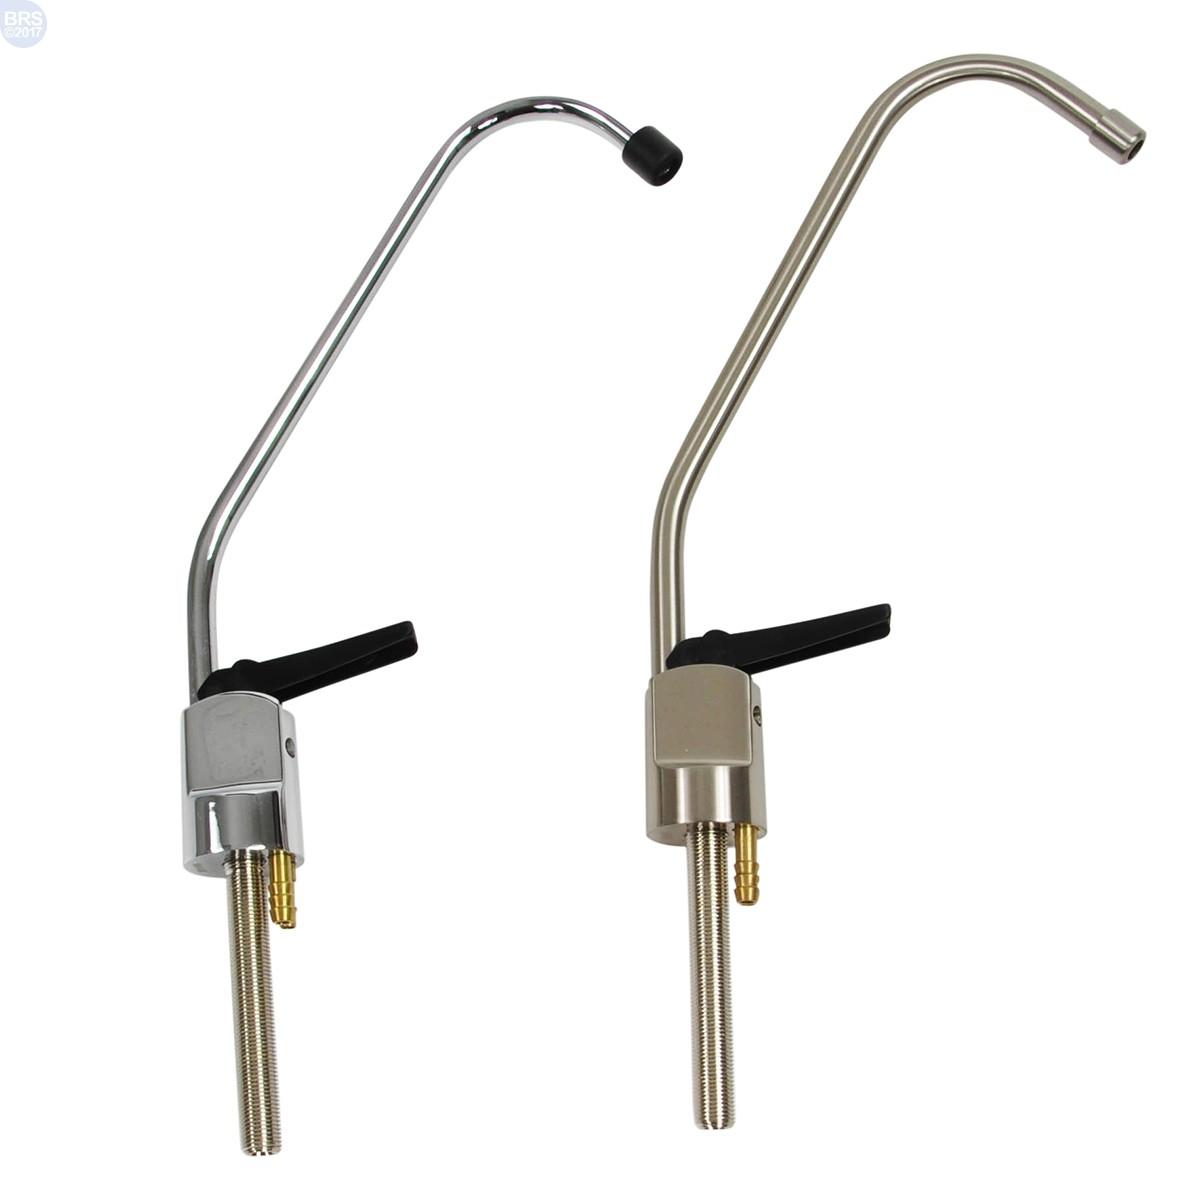 reverse osmosis drinking water air gap faucet reverse osmosis drinking water air gap faucet reverse osmosis air gap faucet bulk reef supply 1200 x 1200 1